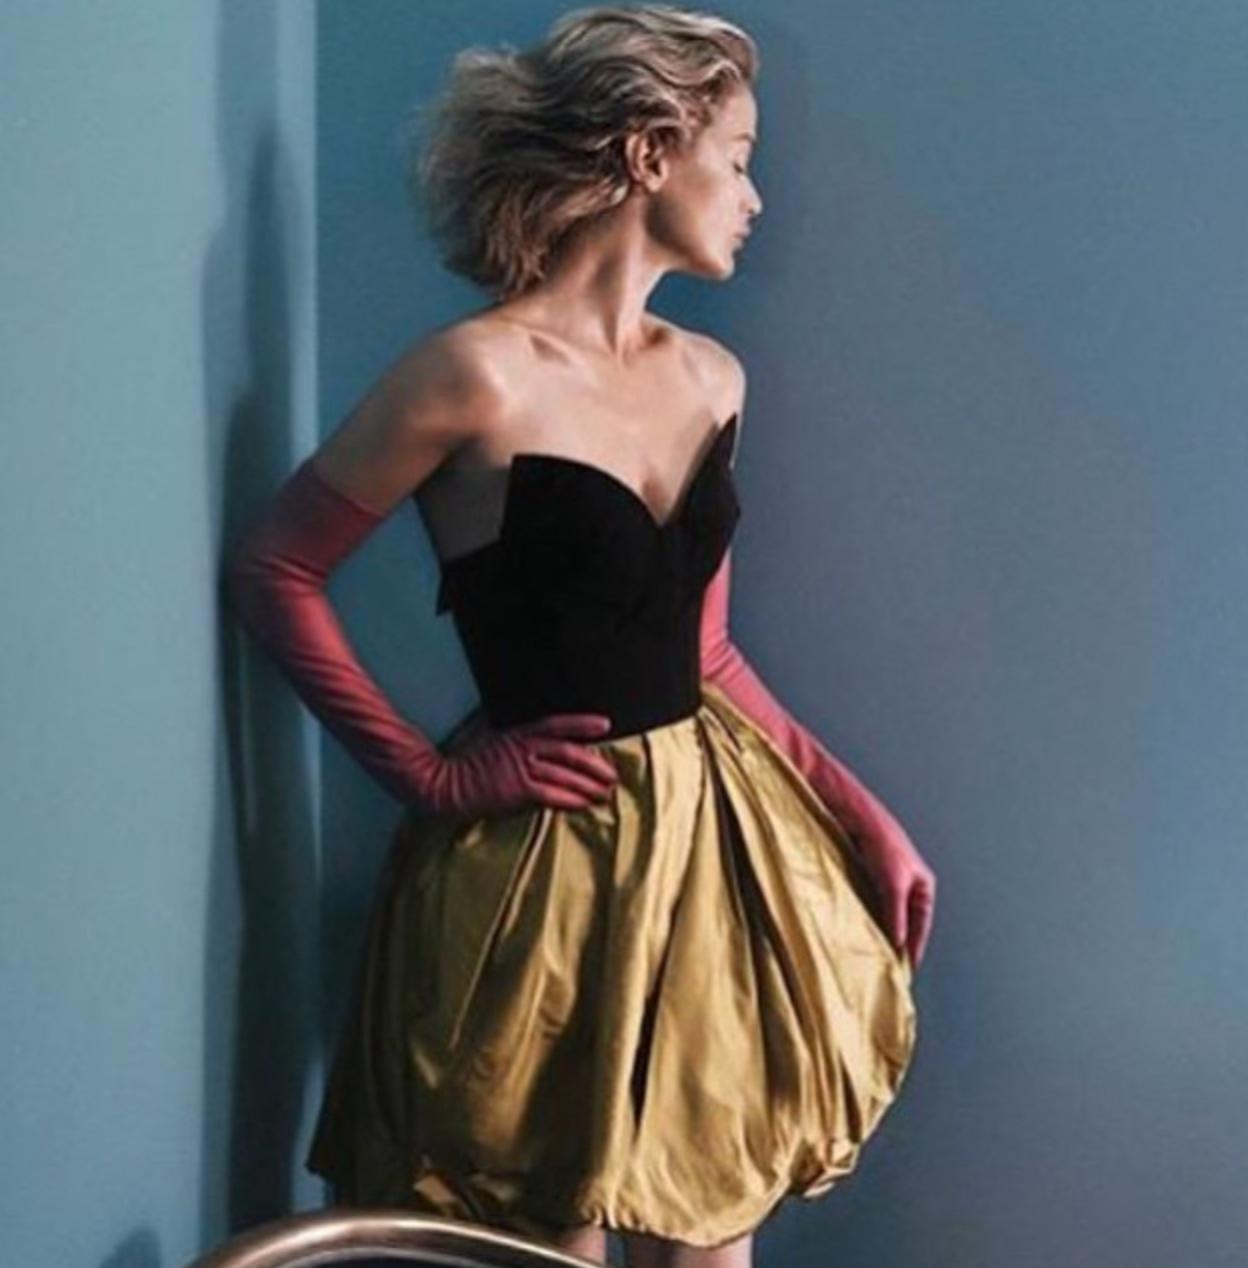 Carolyn Murphy in Oscar de la Renta Fall/Winter 2015 campaign (photography: David Sims, make-up: Diane Kendal) via fashioned by love / british fashion blog